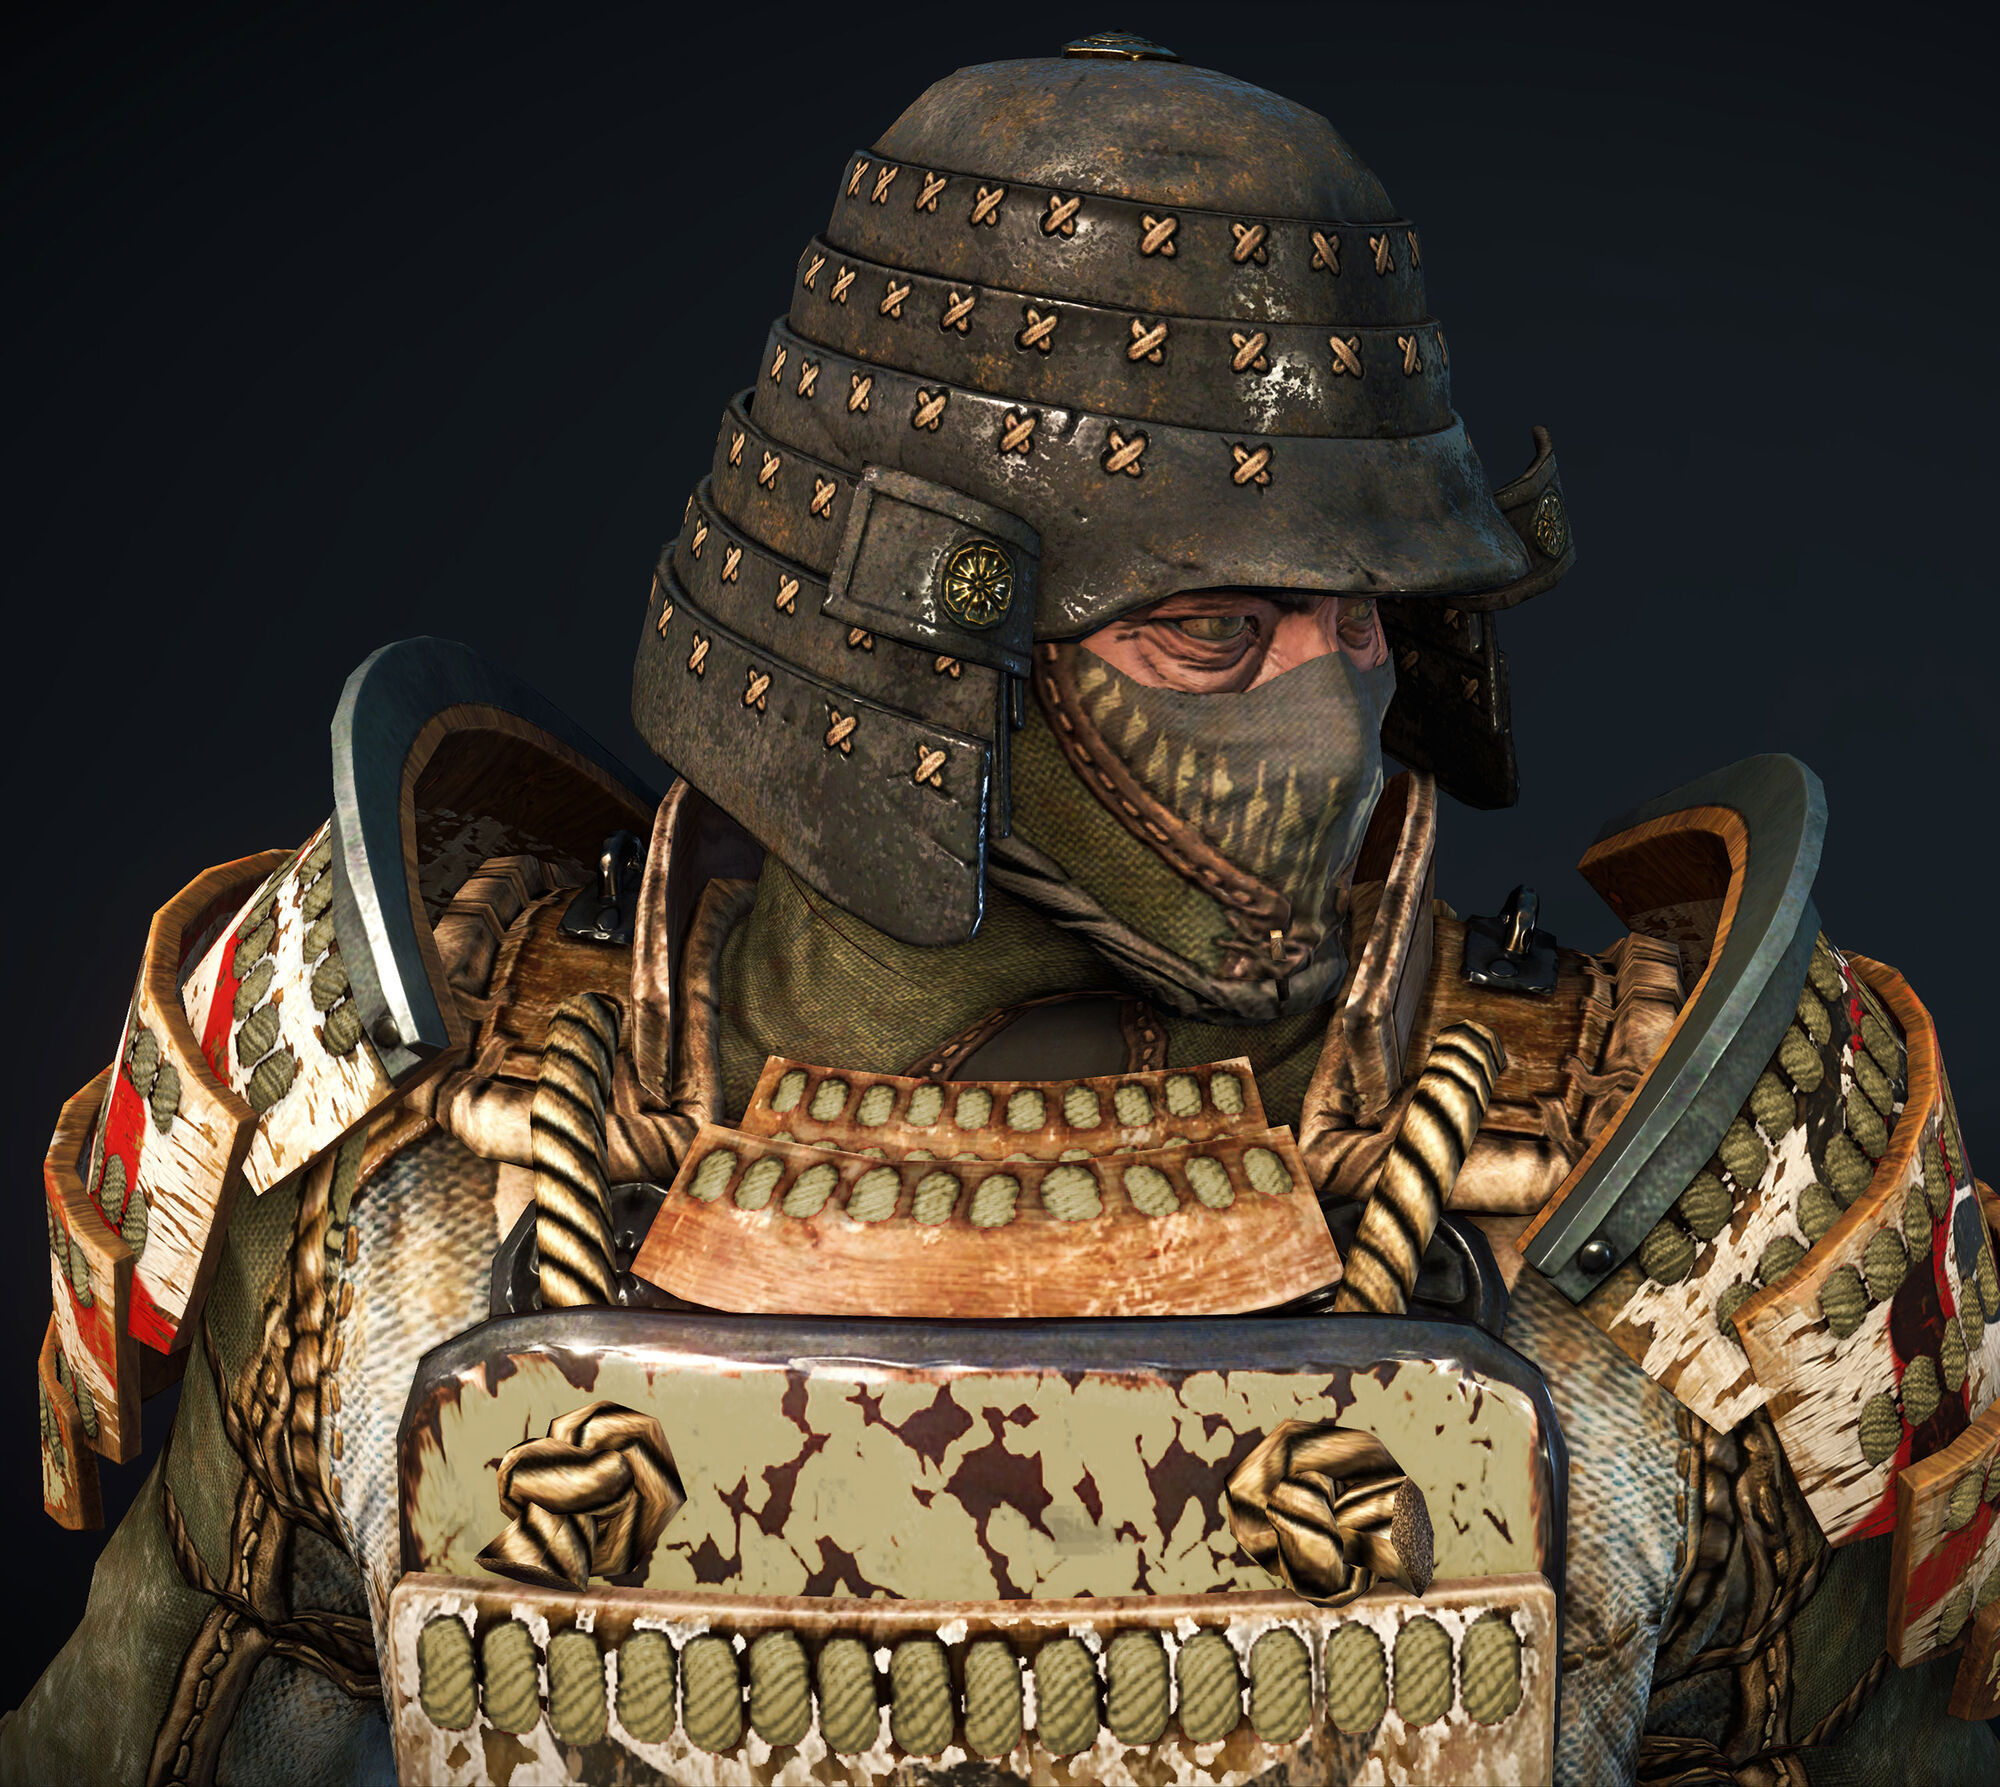 Image - Fh Hero-detail-orochi-armor-2 Ncsa.jpg